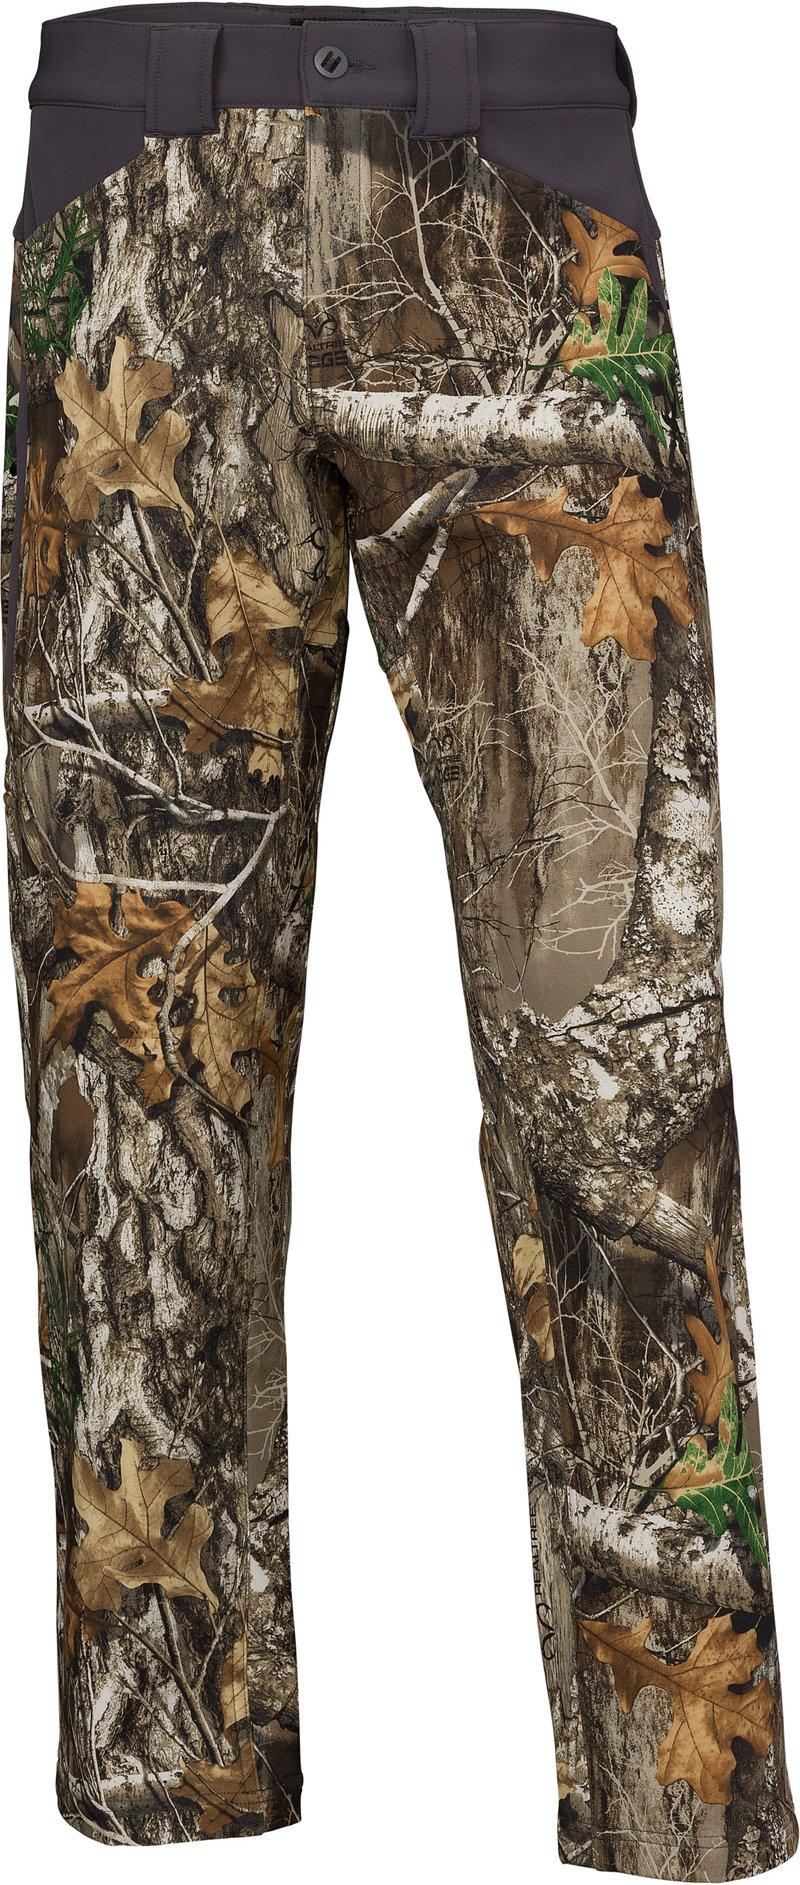 Browning Men's Broadhead Camo Pants - Camo Clothing, Adult Insulated Camo at Academy Sports thumbnail